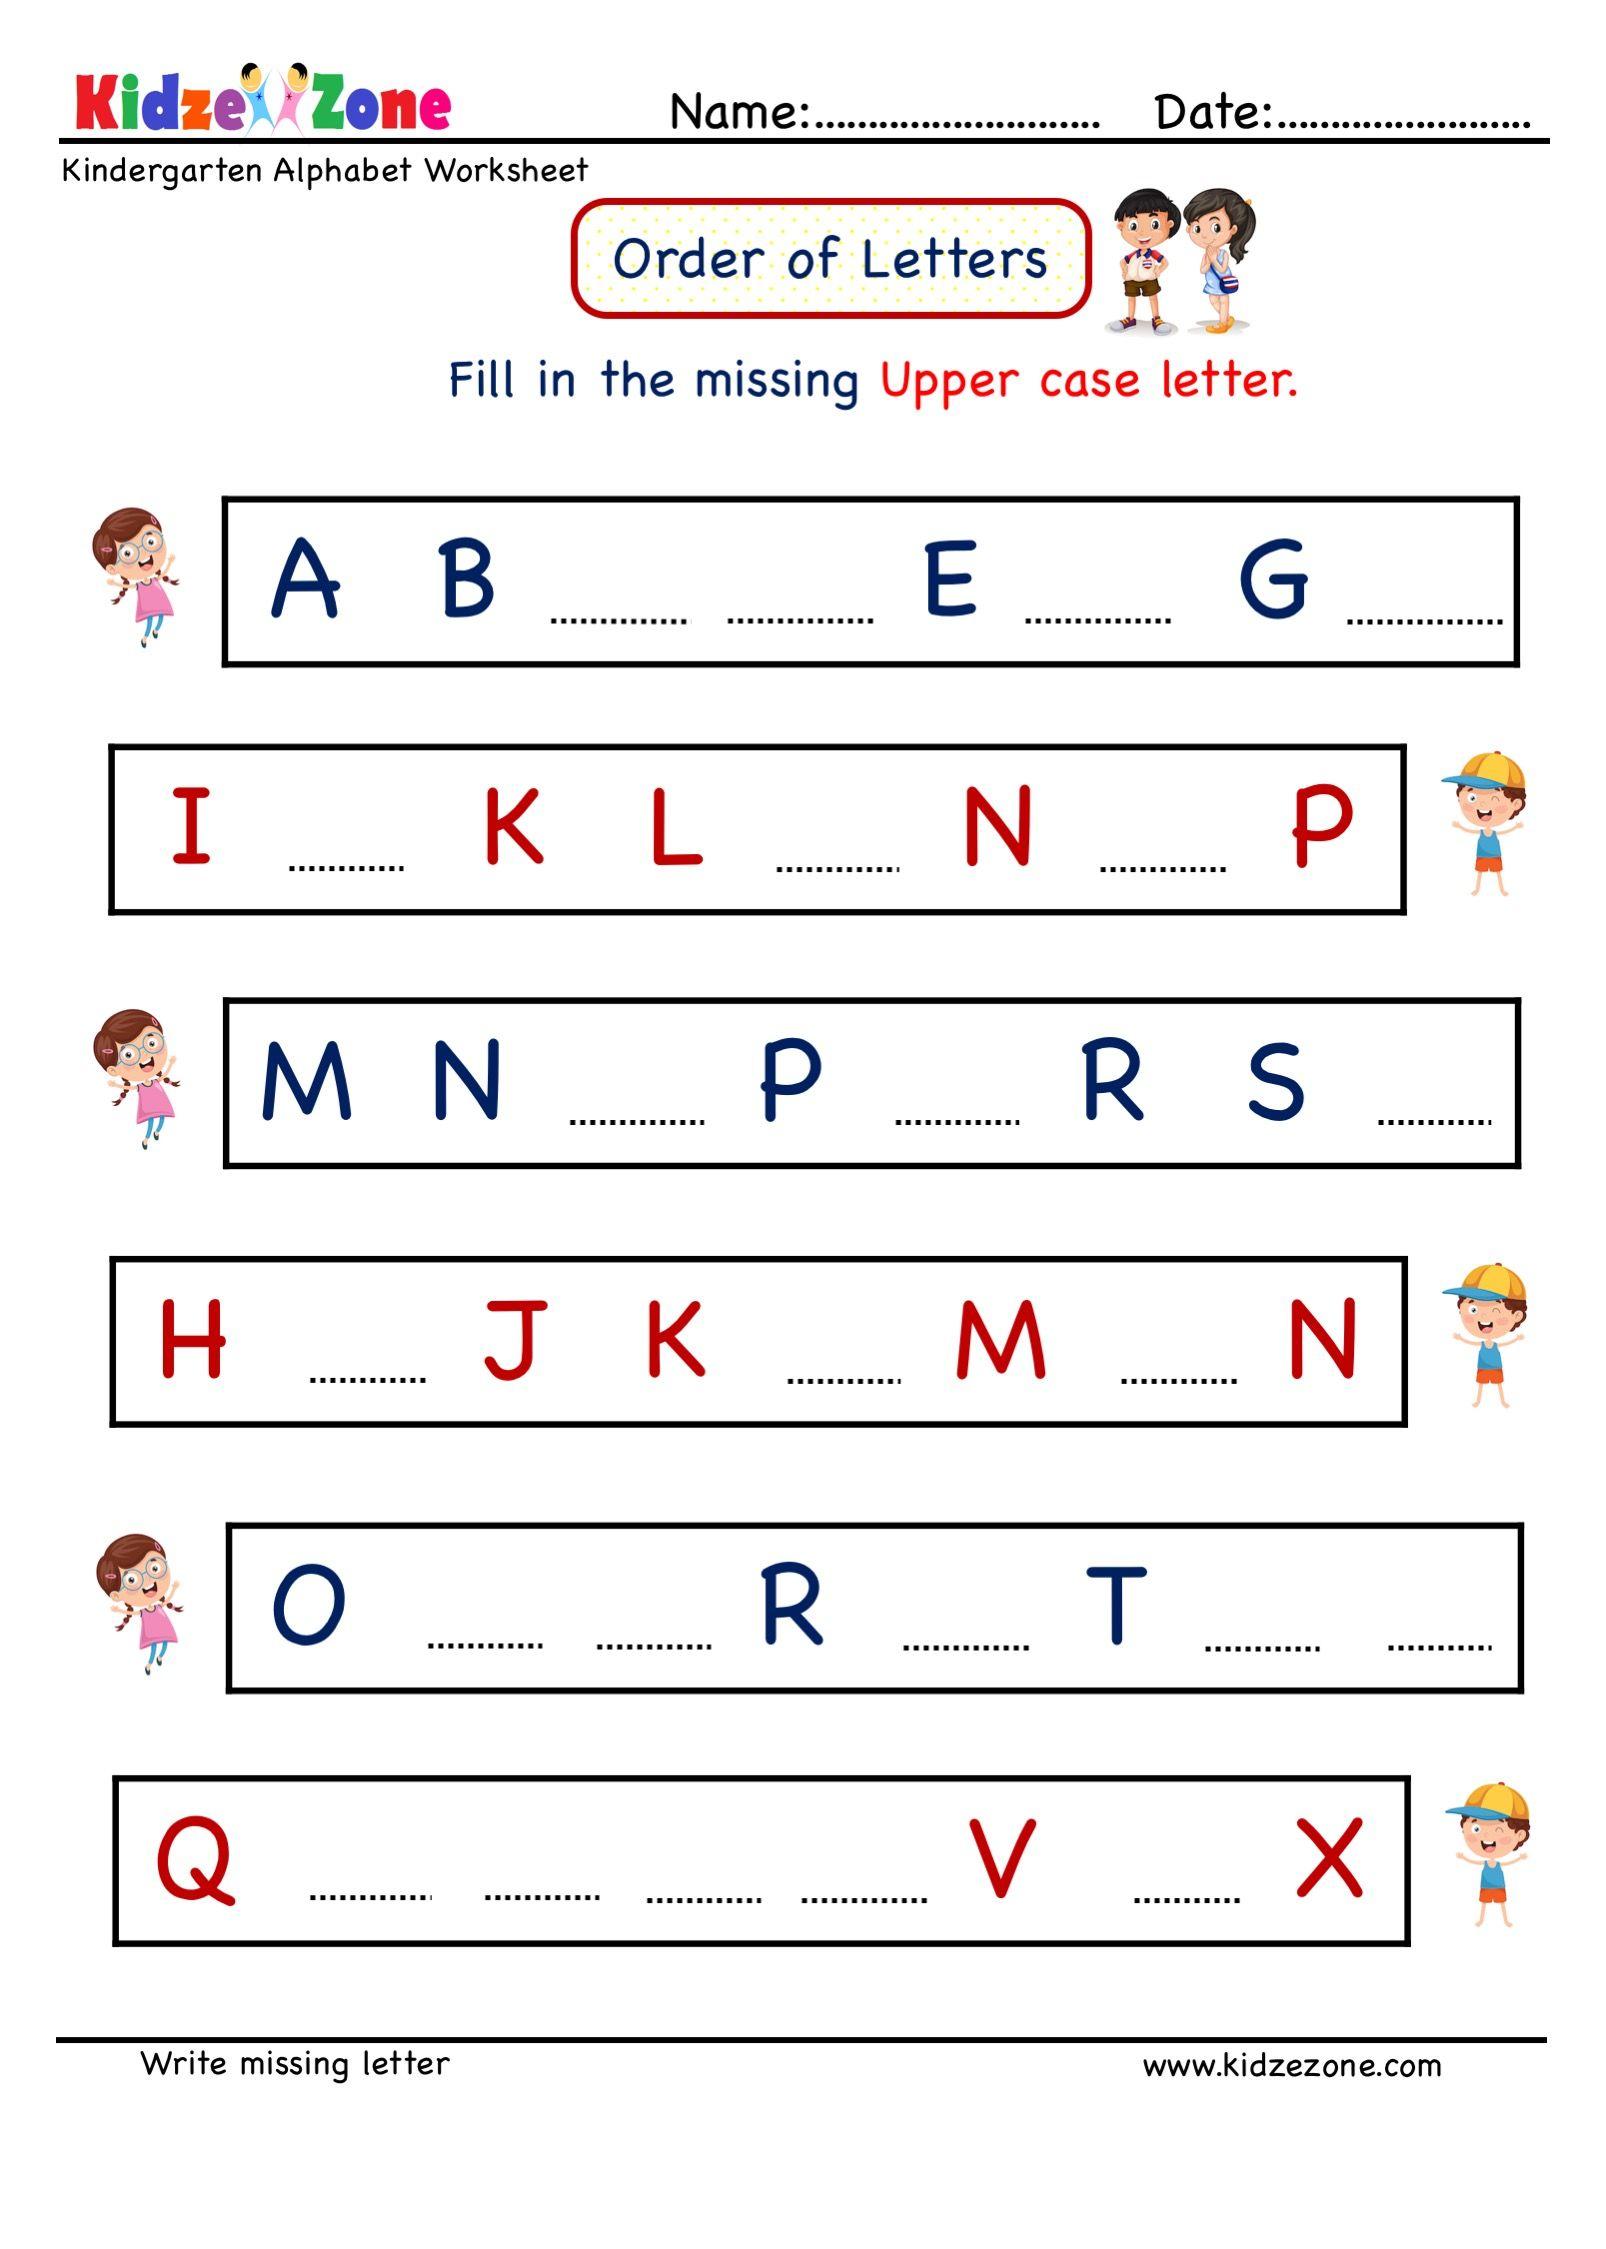 Kindergarten Letter Writing Worksheets